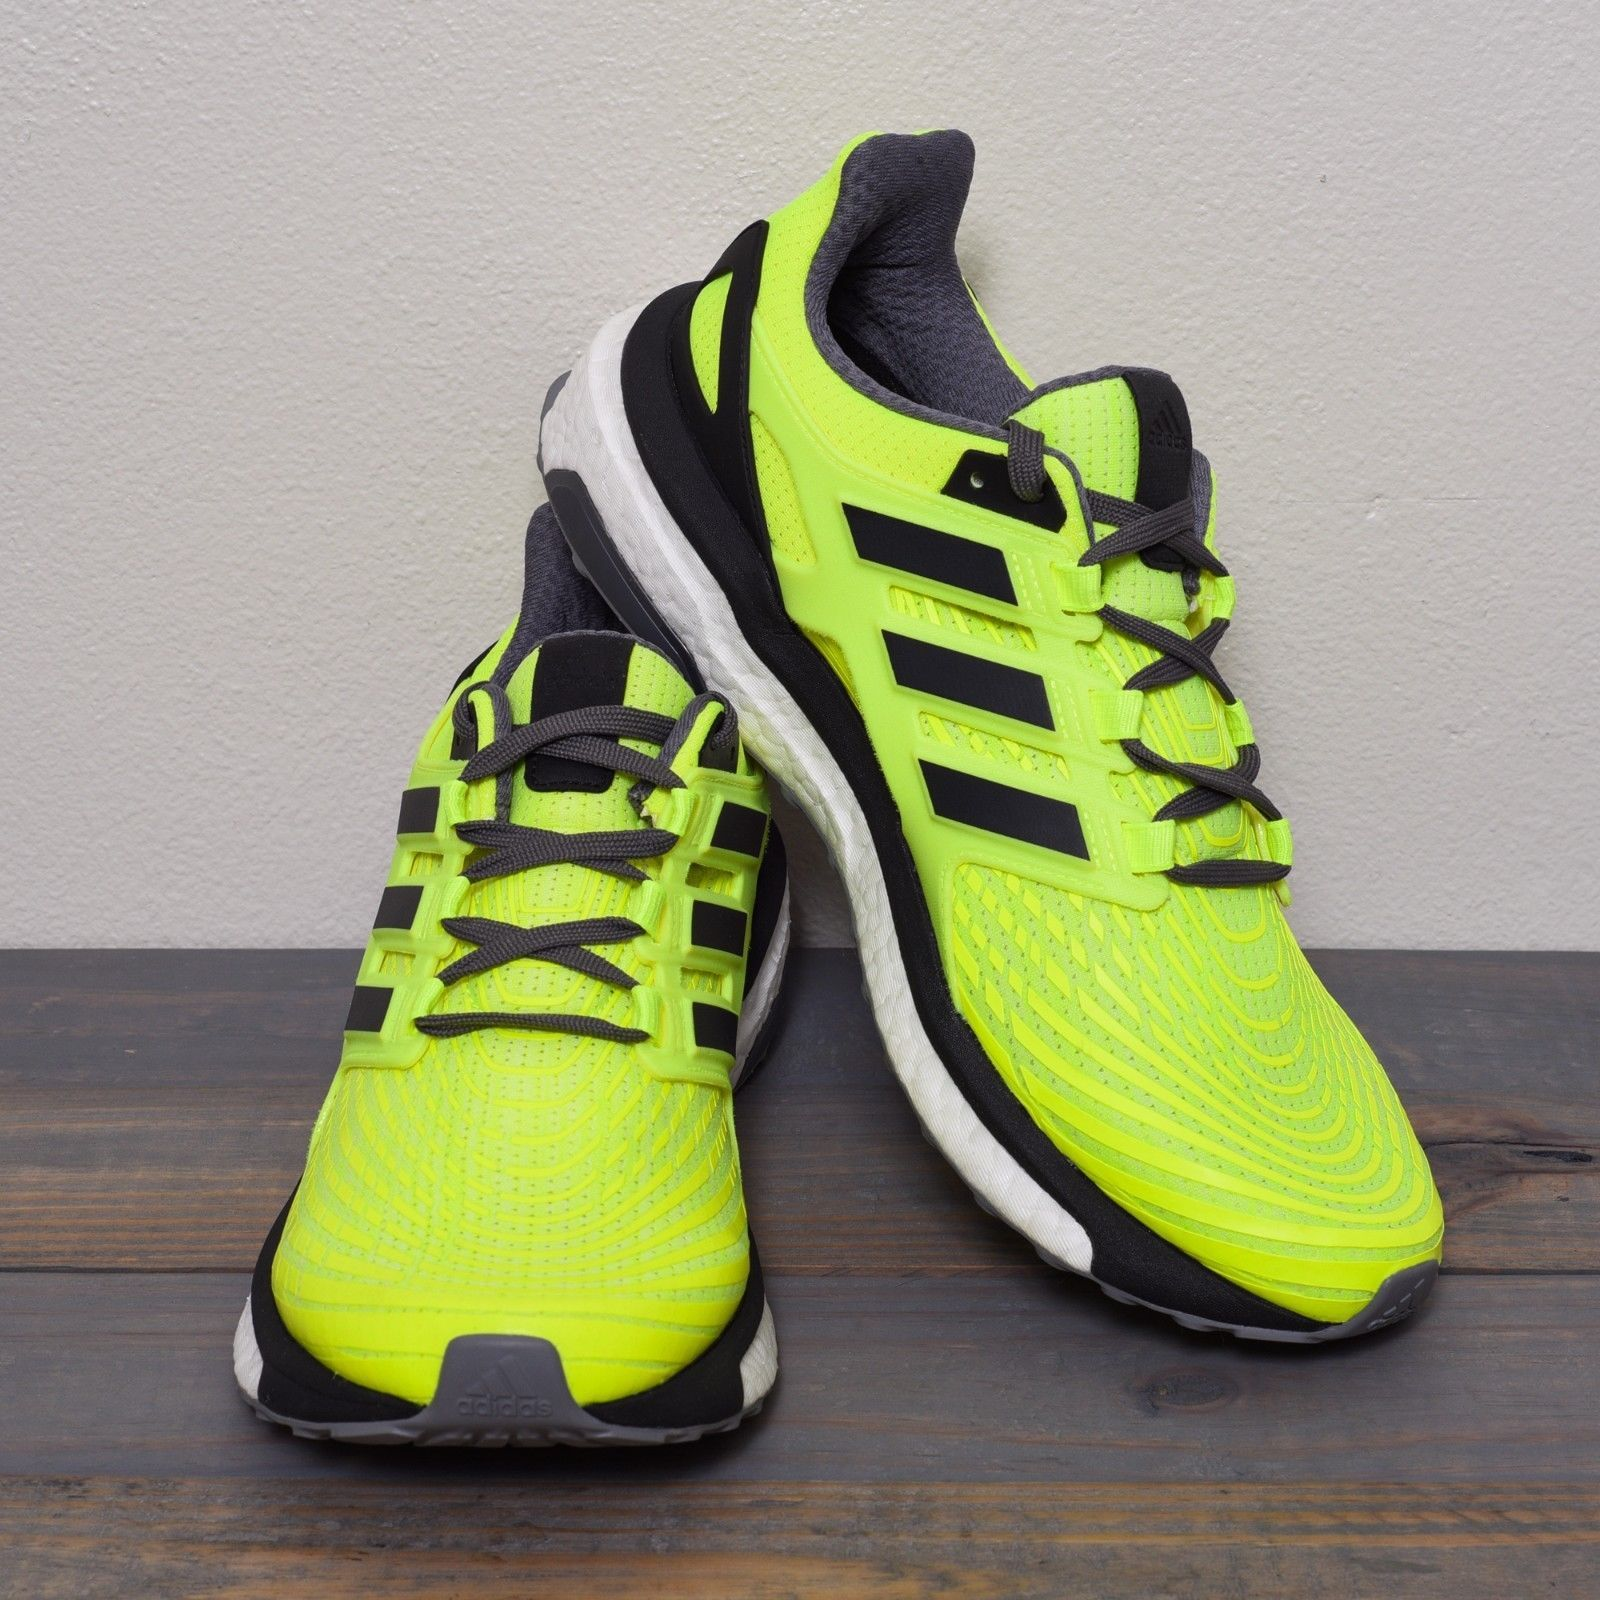 2d3e5a38e ... adidas energy boost men s size 10 running shoes solar yellow black grey  bb3455